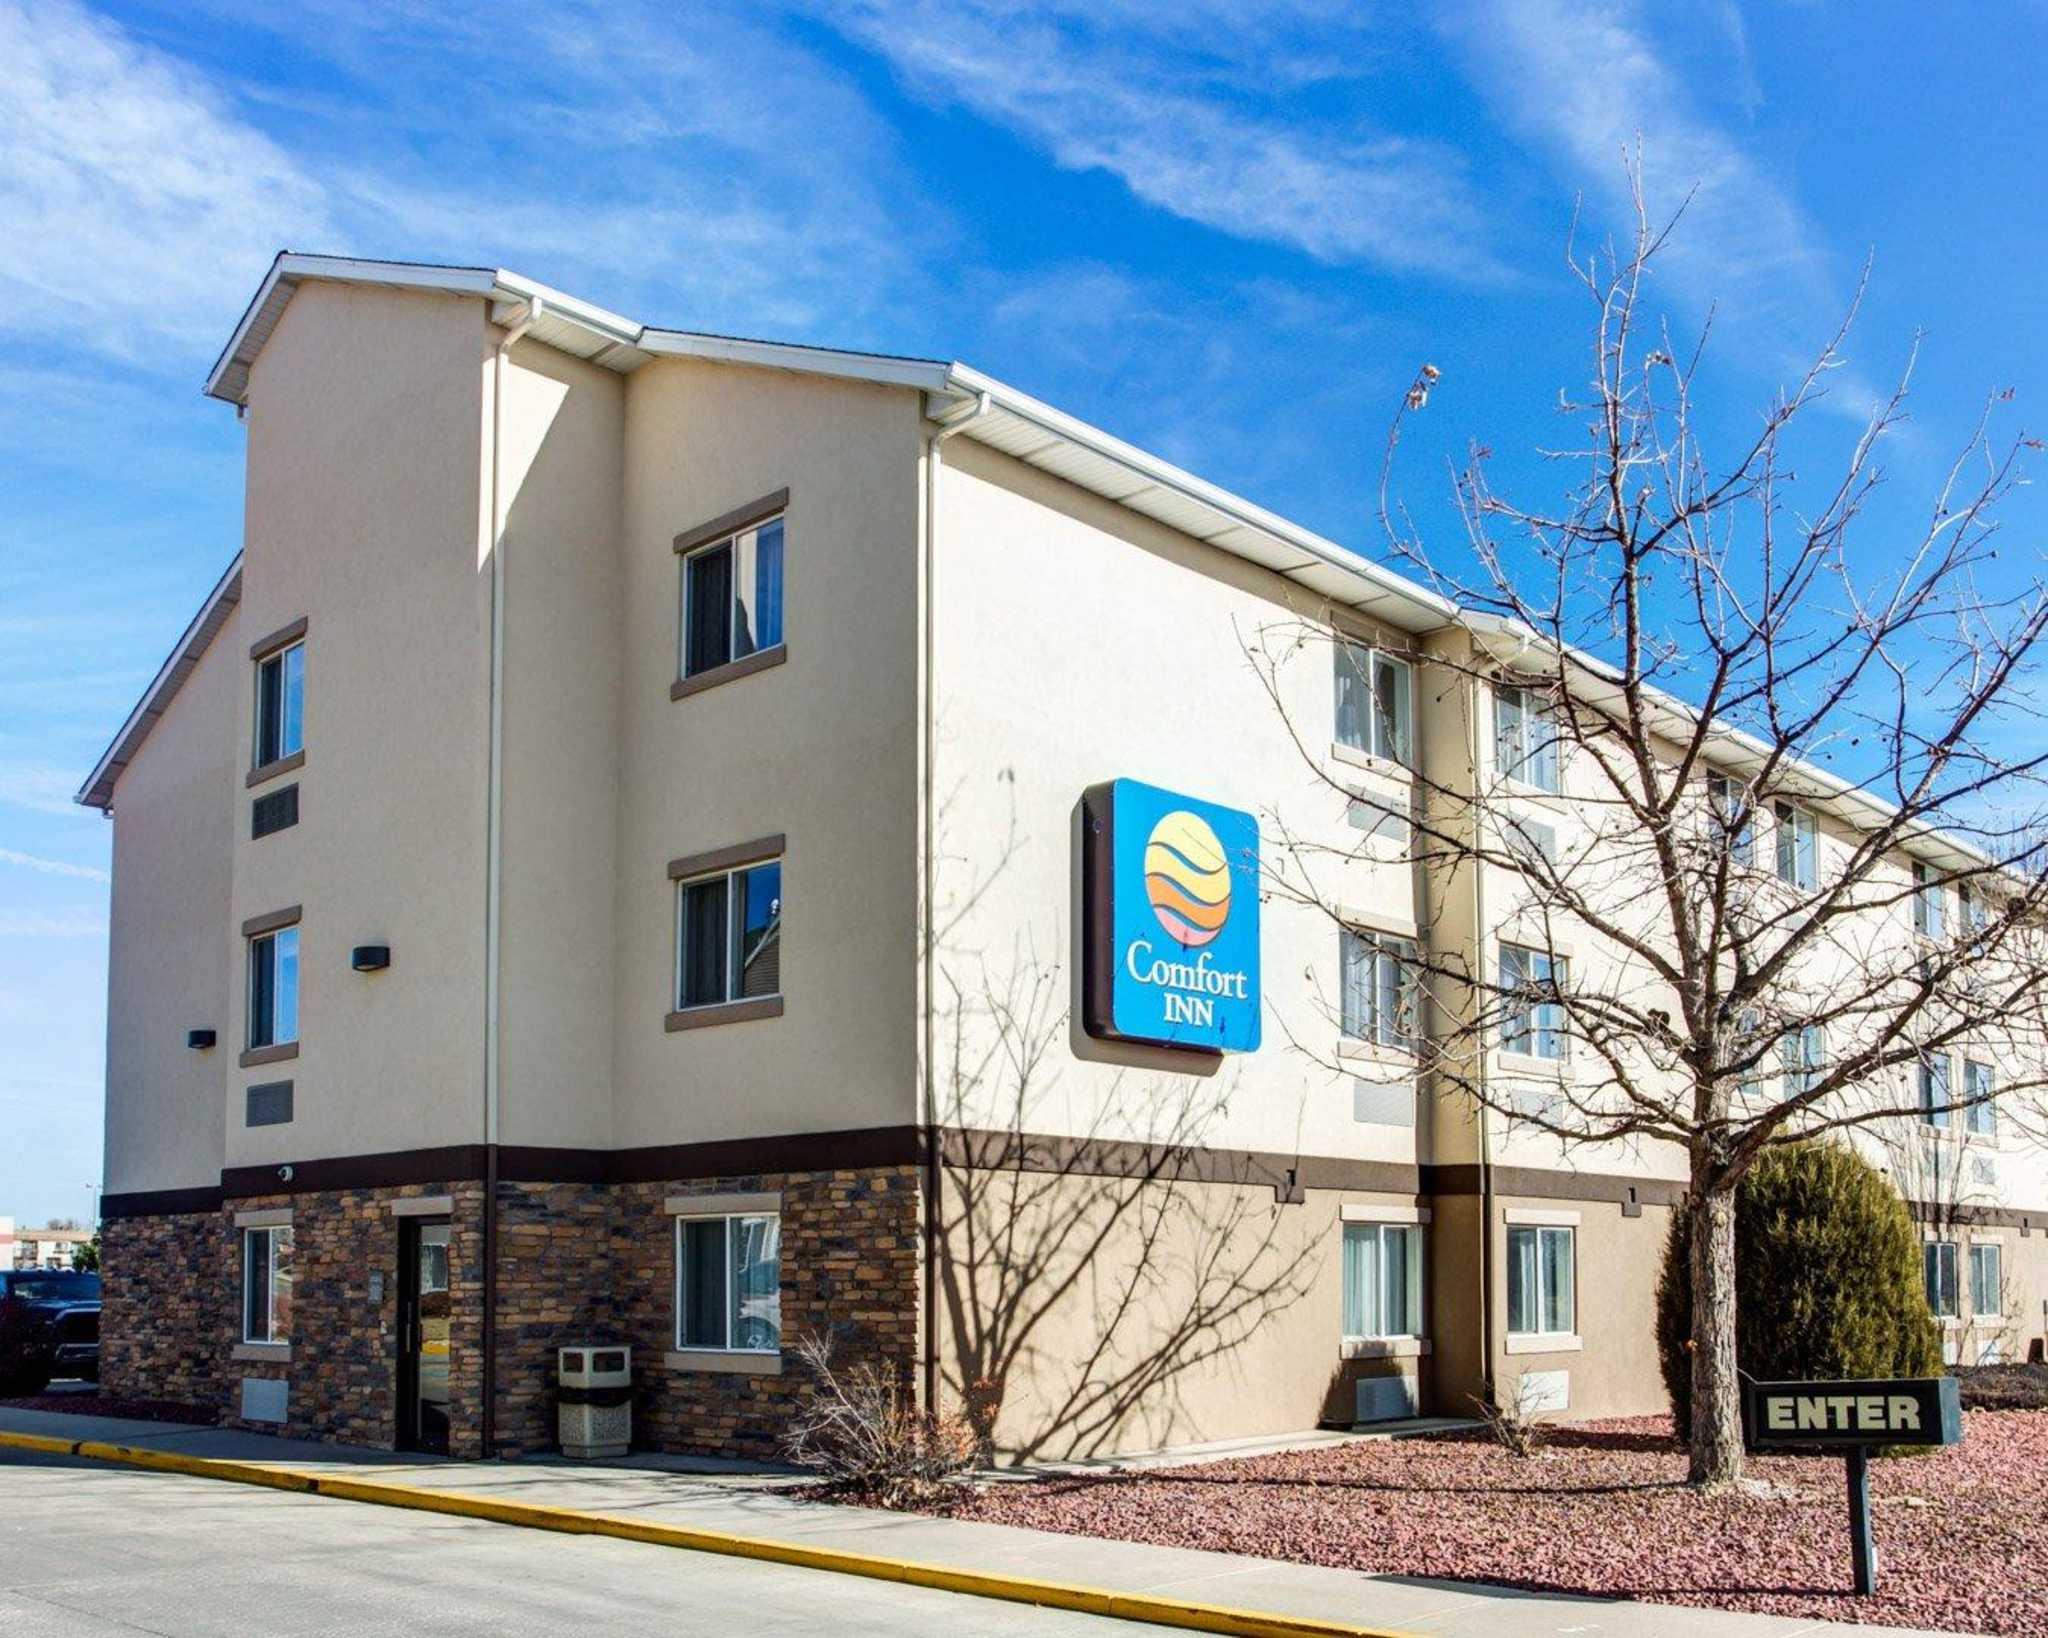 Comfort Inn Greeley Colorado Co Localdatabase Com